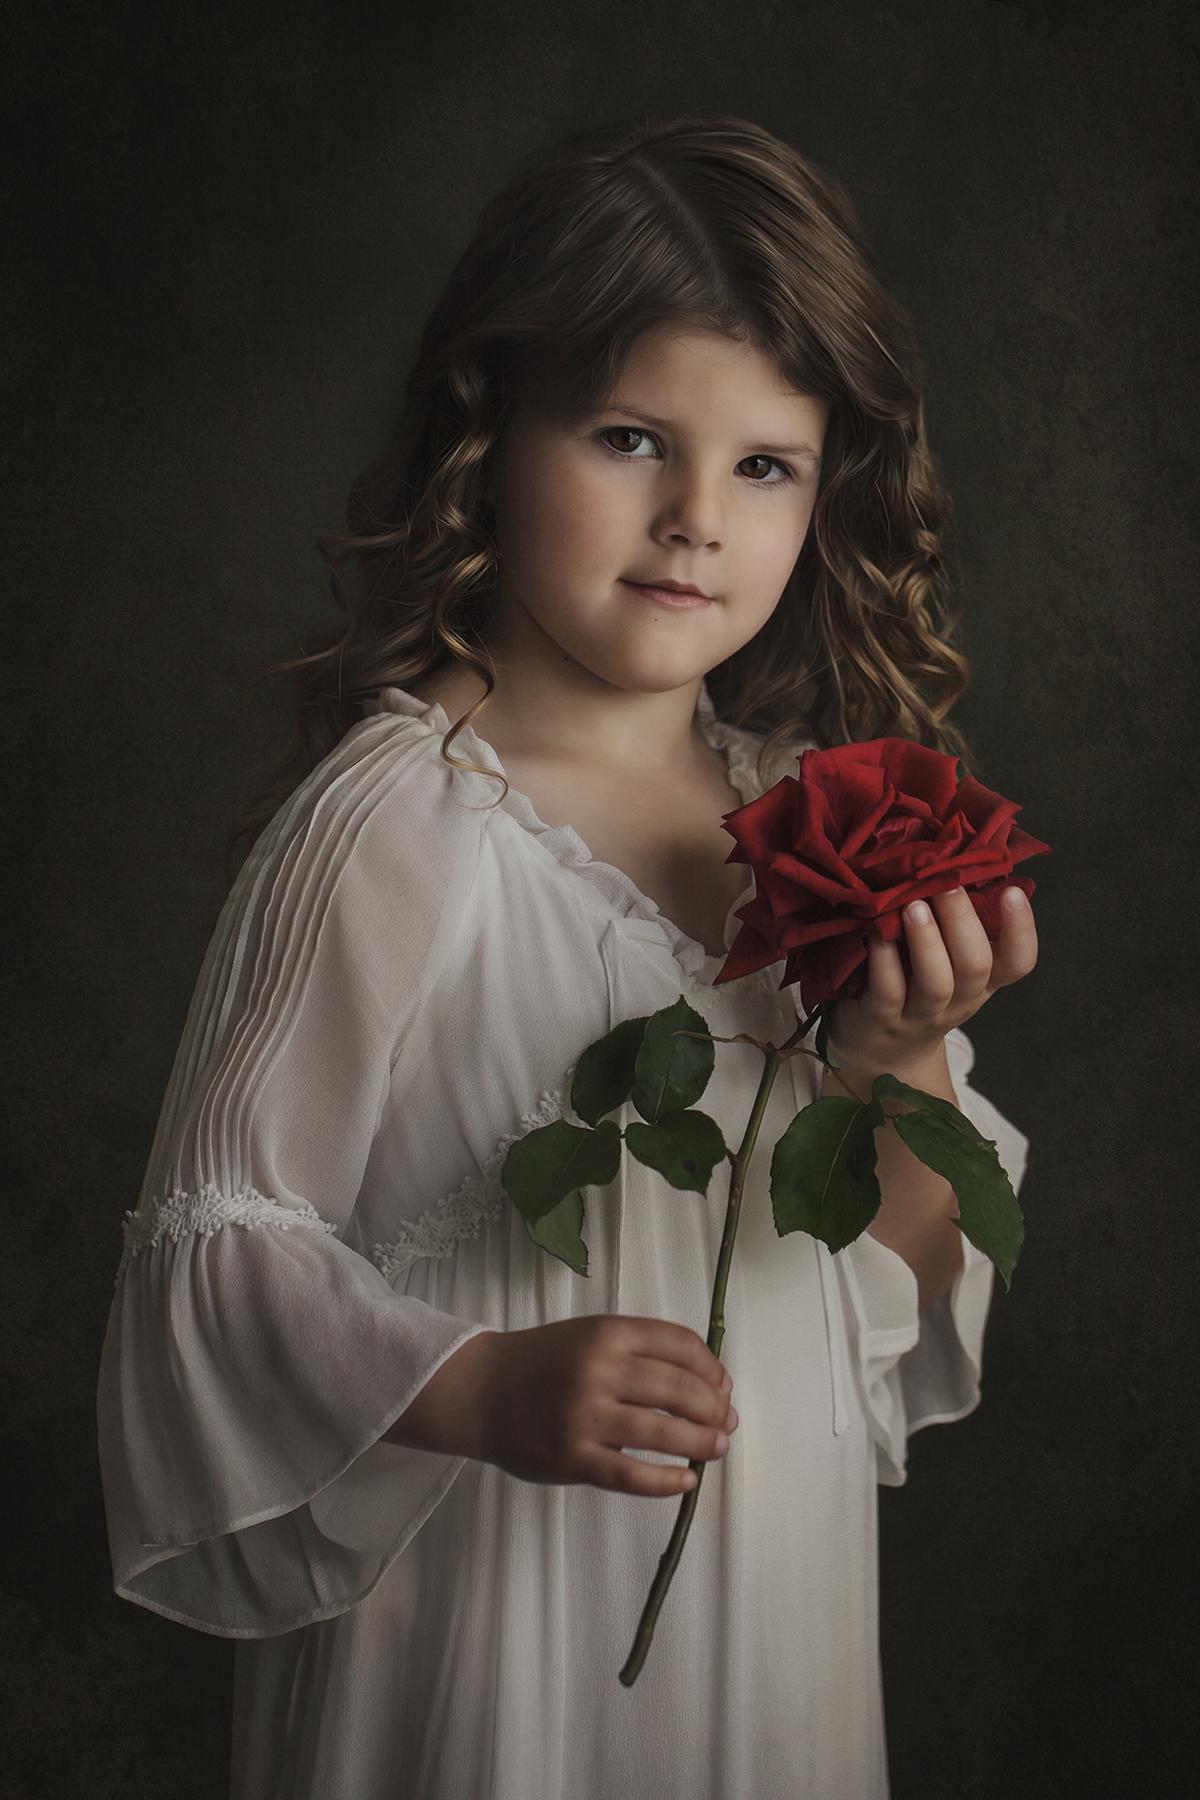 childrens family photographs